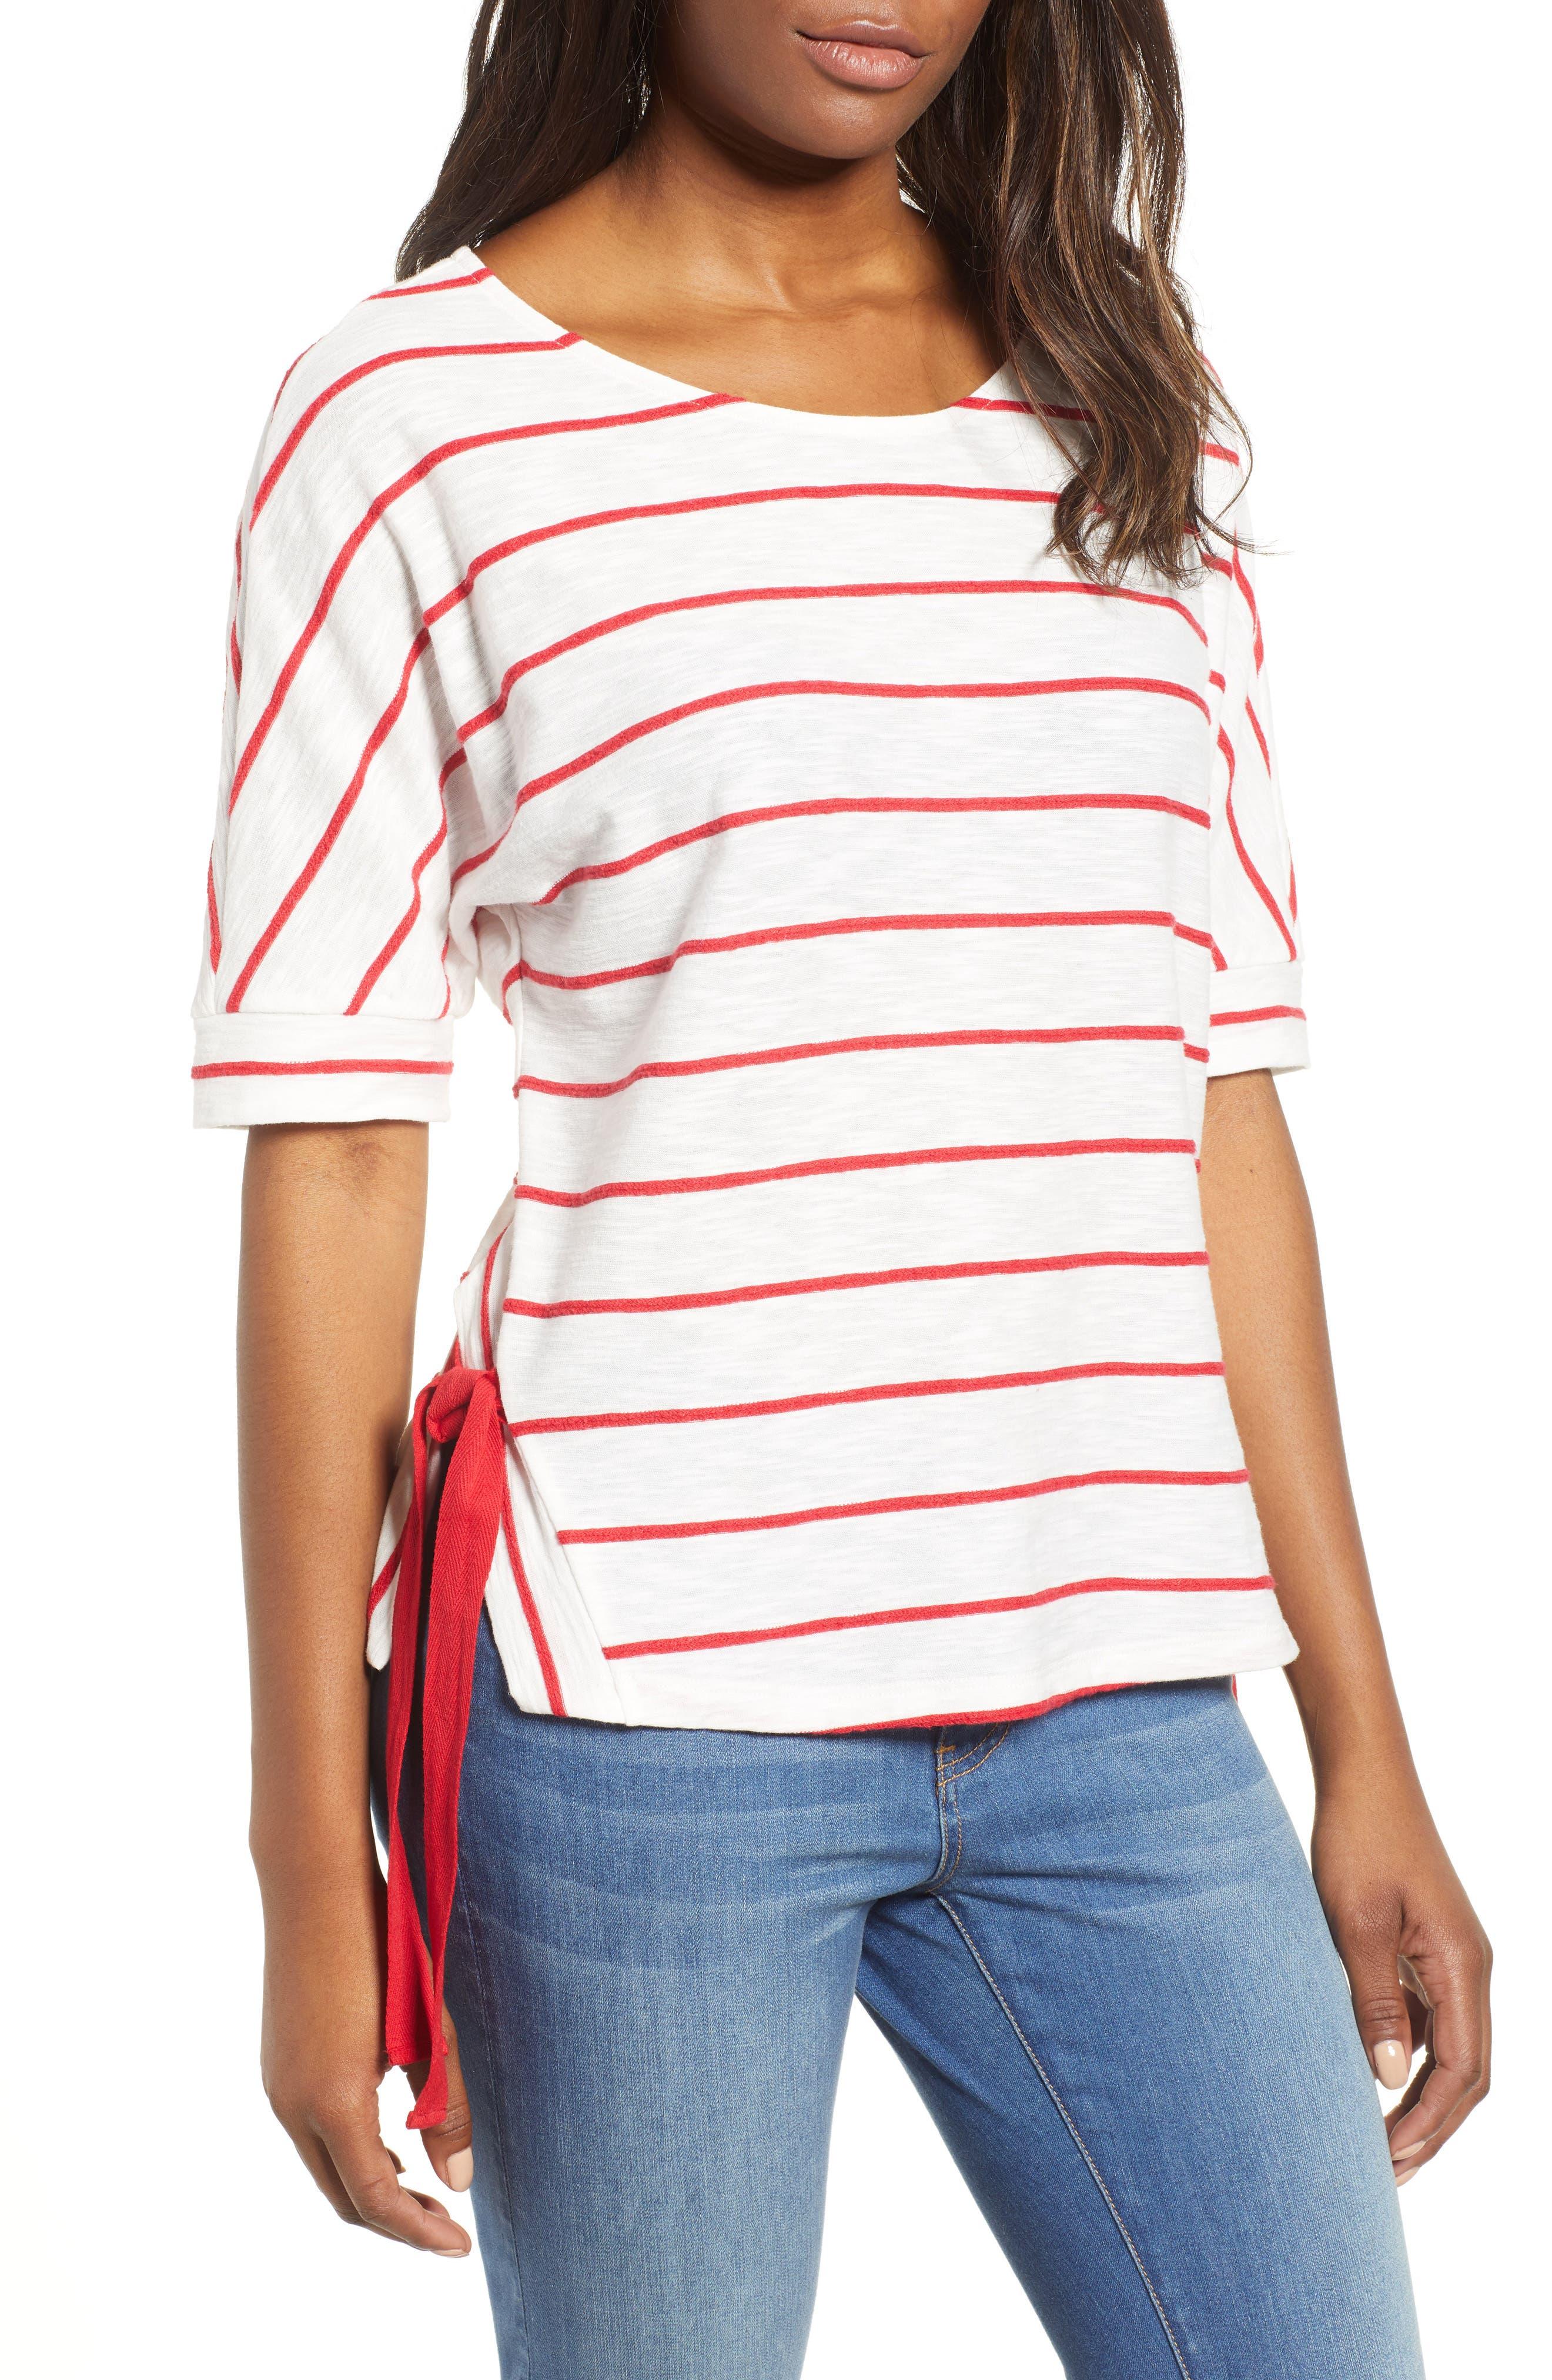 Everleigh Side Tie Stripe Tee (Regular & Petite)